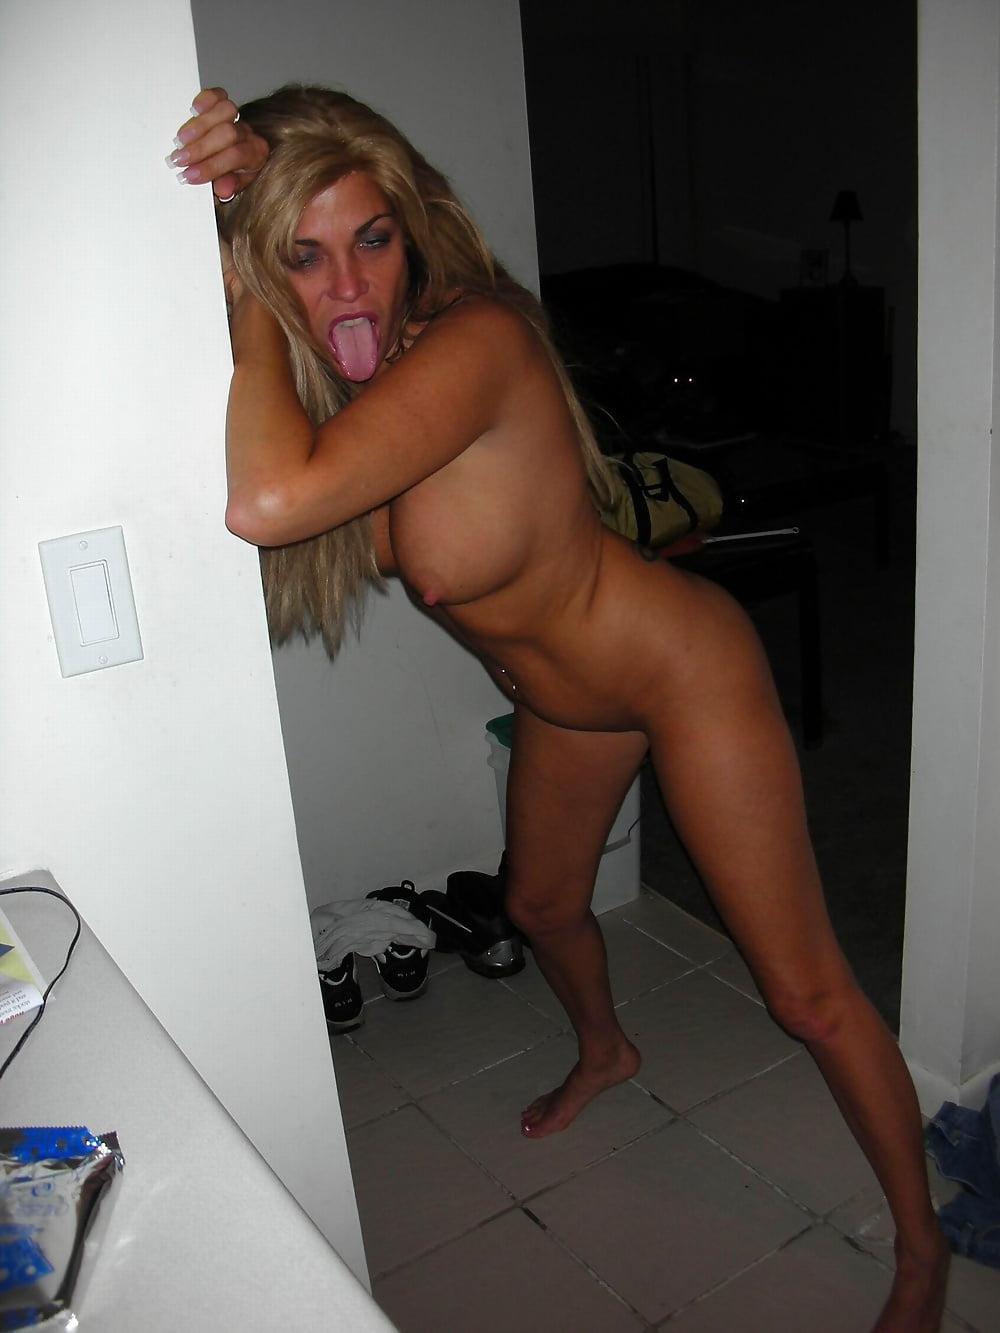 woman-wasted-naked-sleeping-gangbang-stories